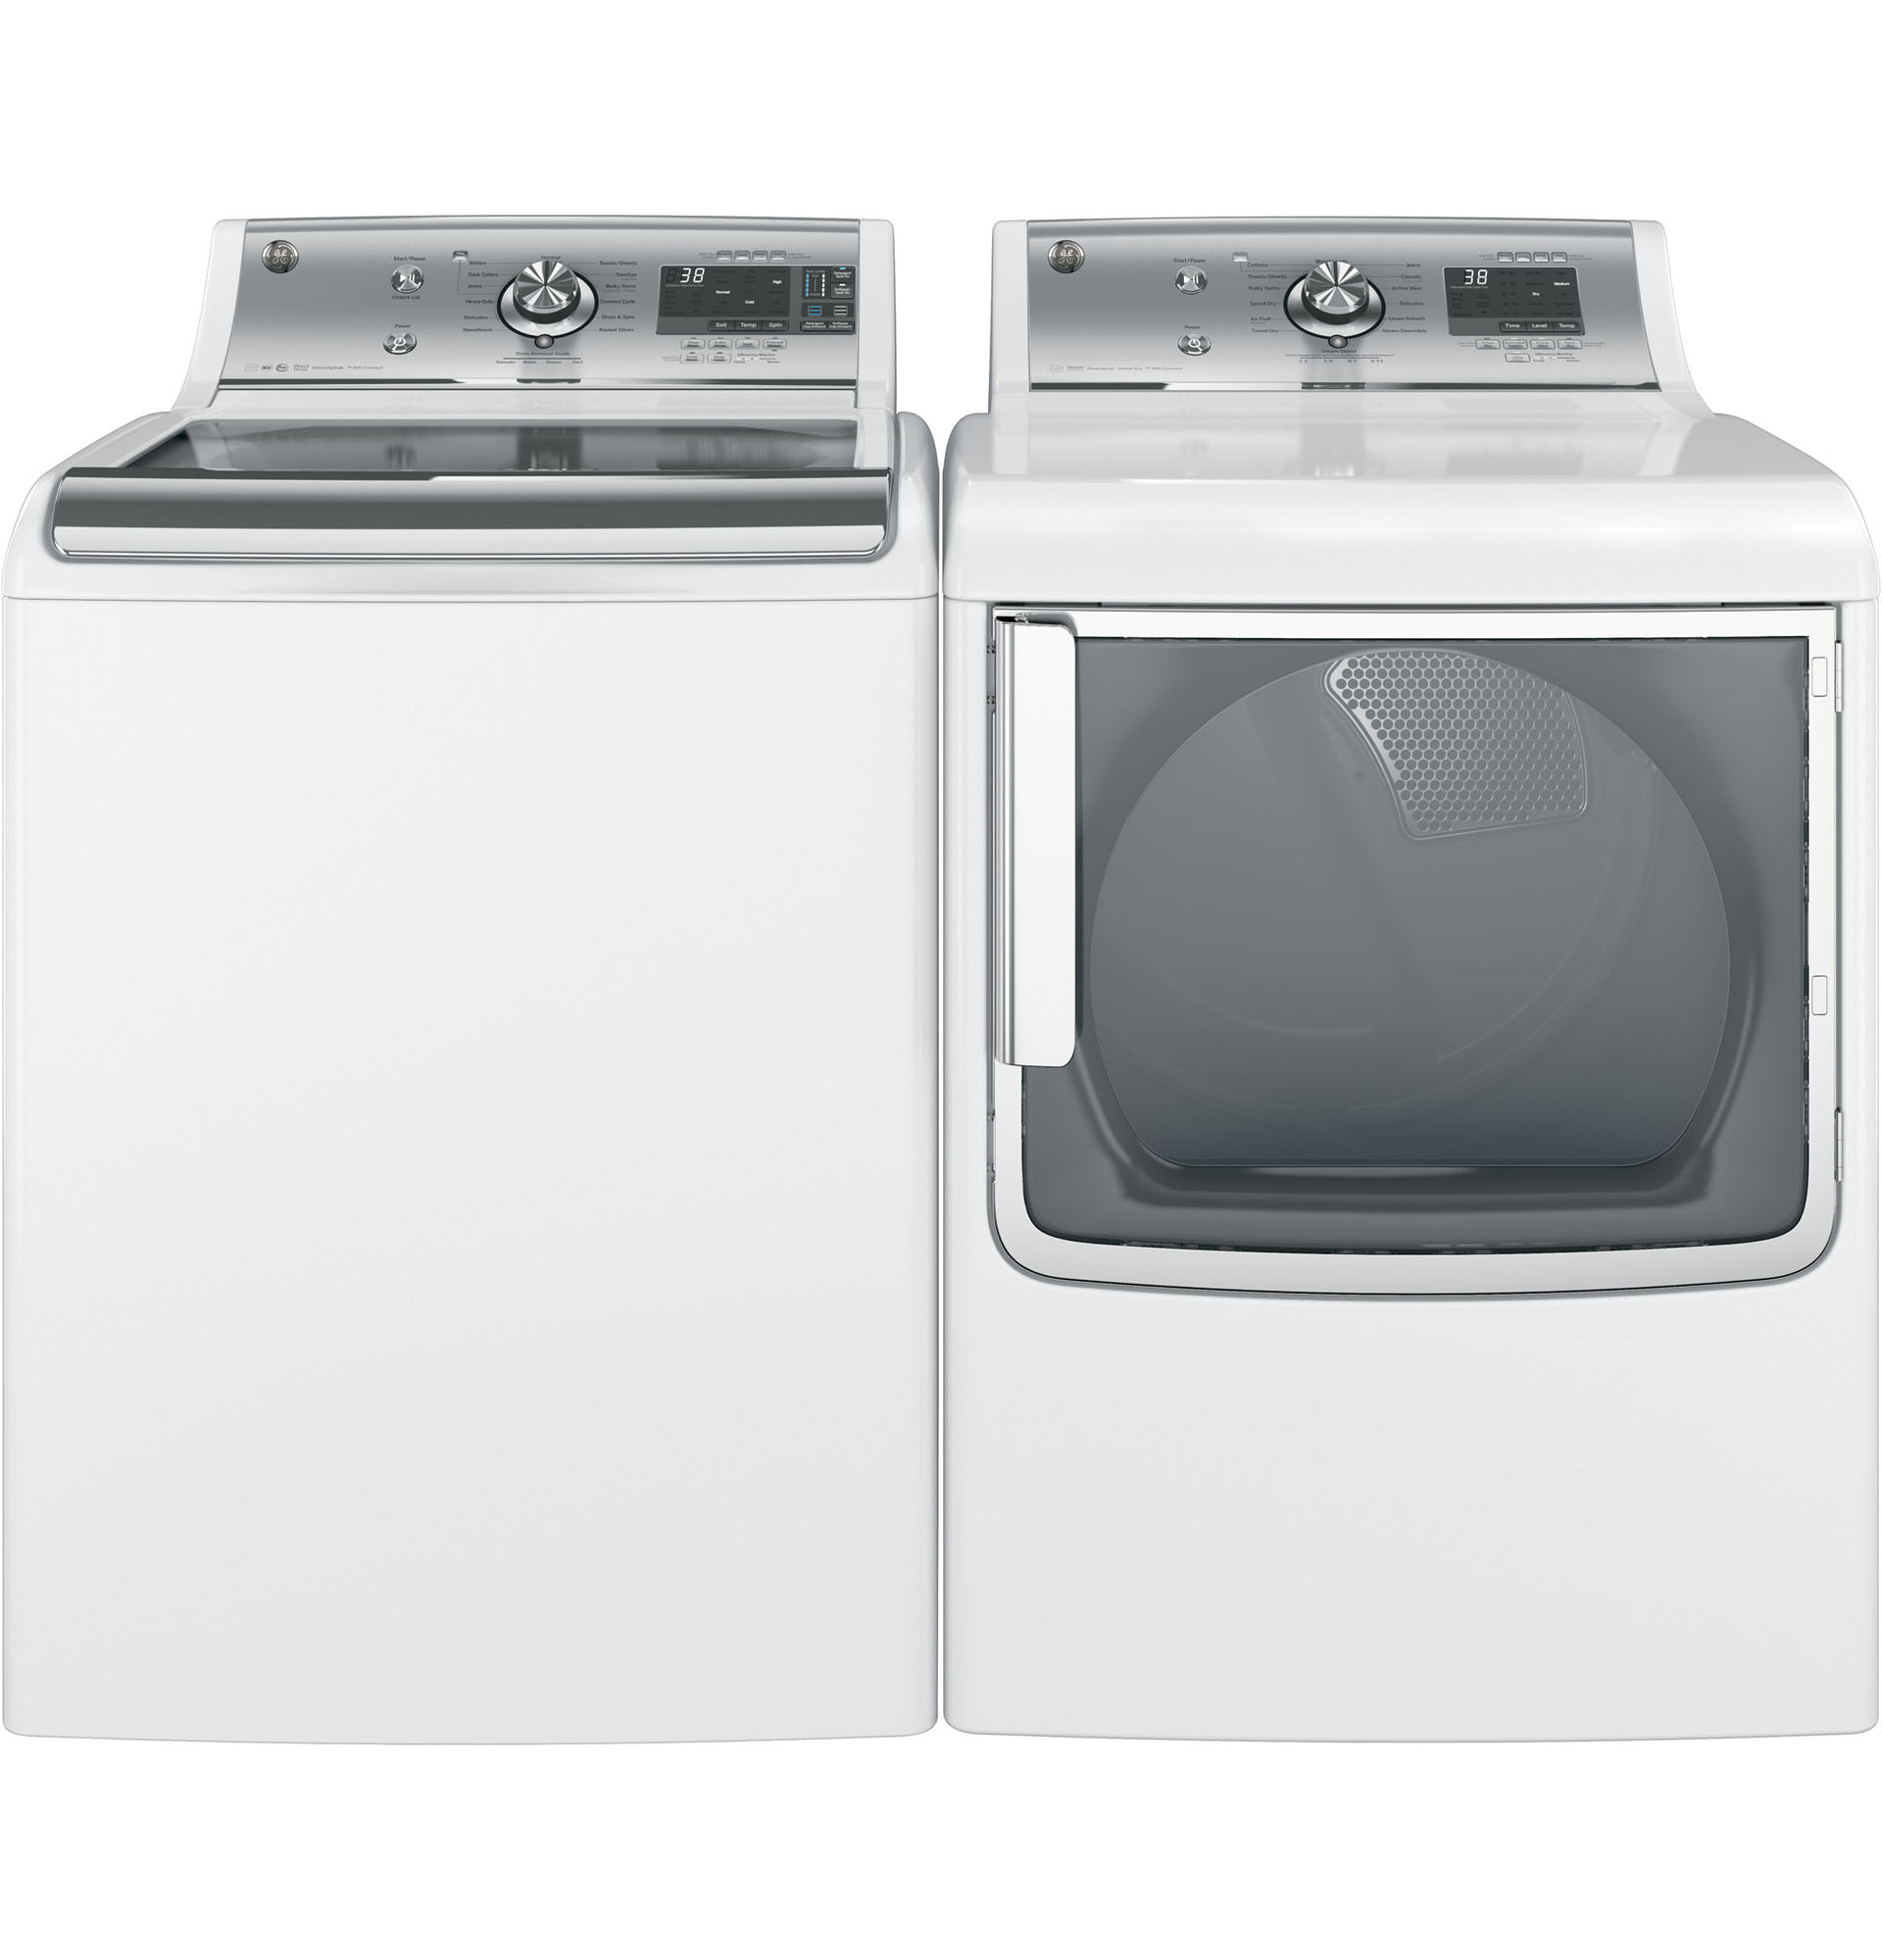 GE Appliances GTD86ESSJWS 7.8 cu. ft. Electric Dryer - White